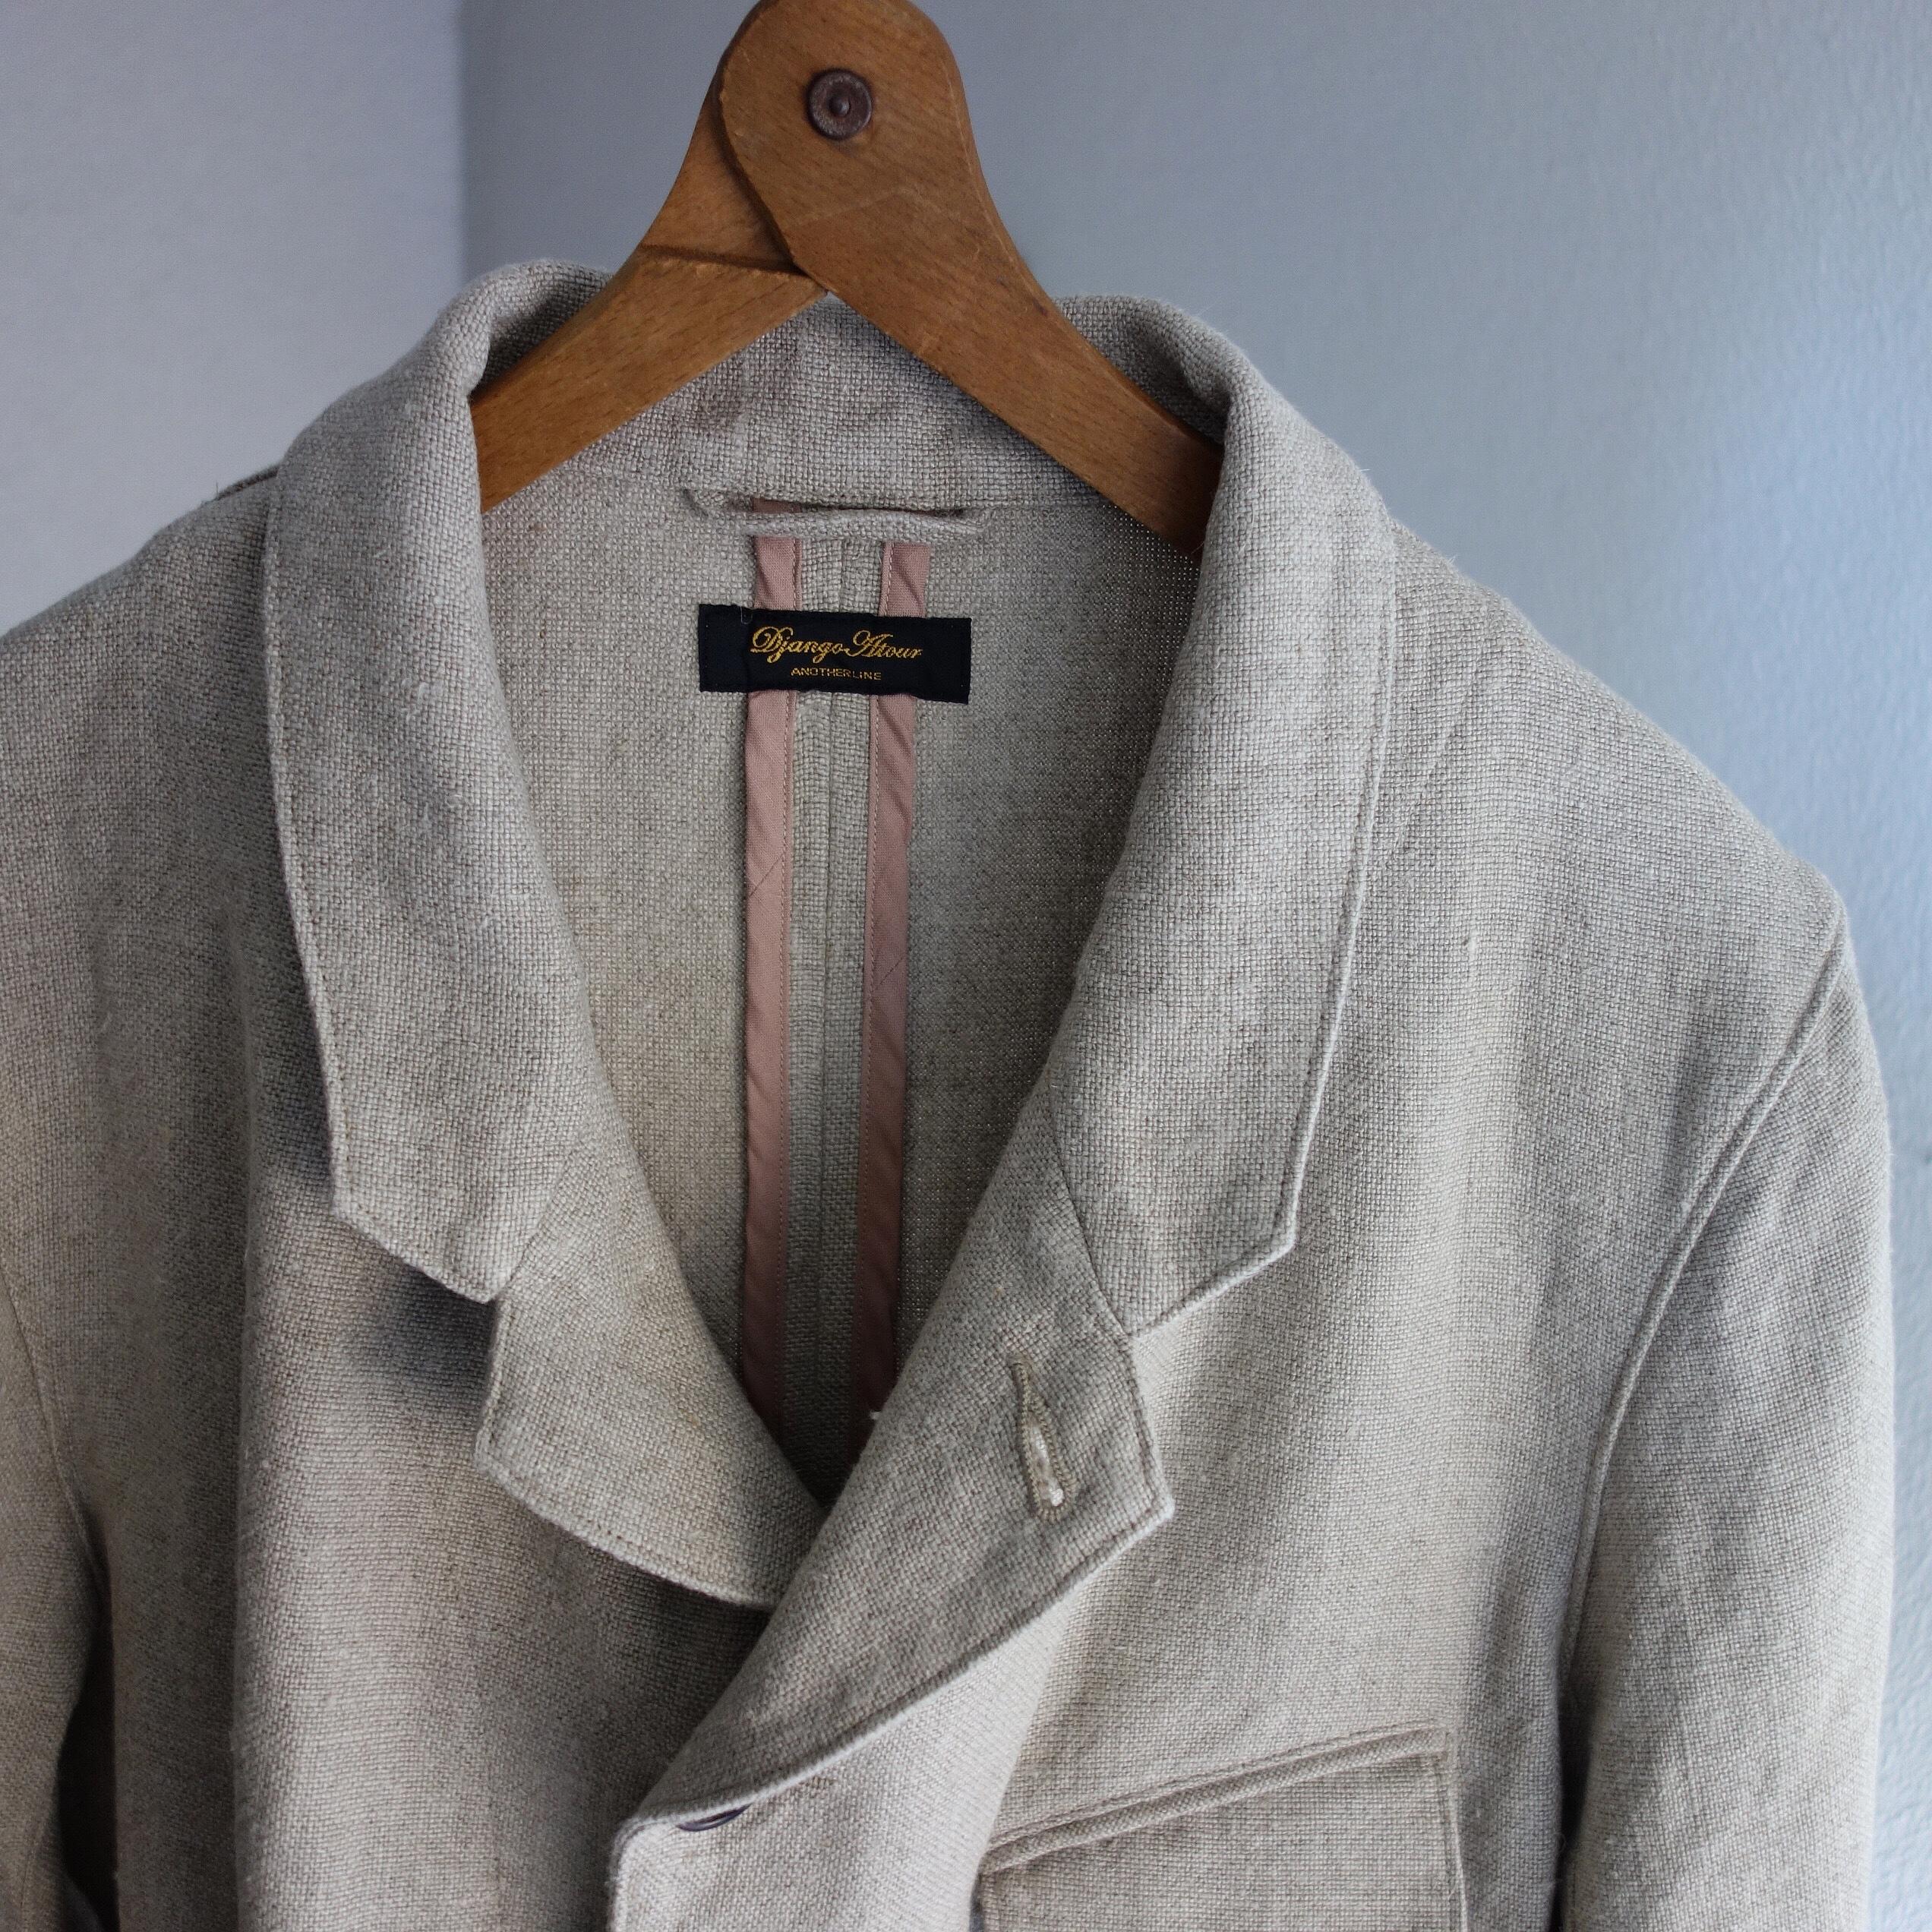 classic farmers heavylinen tailor jkt / ecru